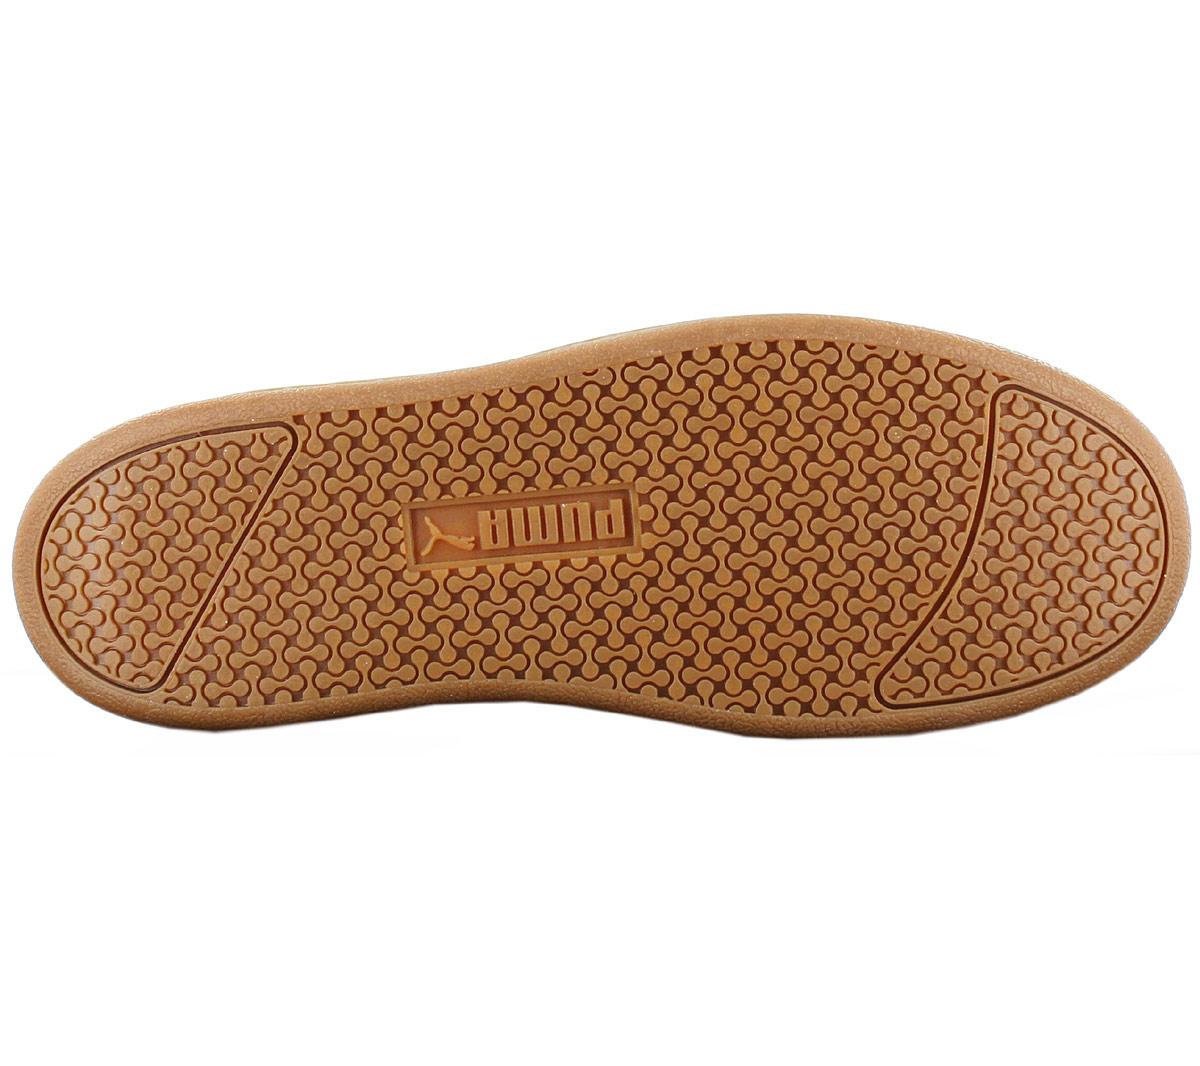 058870be3f2c4d NEW Puma Smash Platform Leather 366487-02 Women`s Shoes Trainers ...